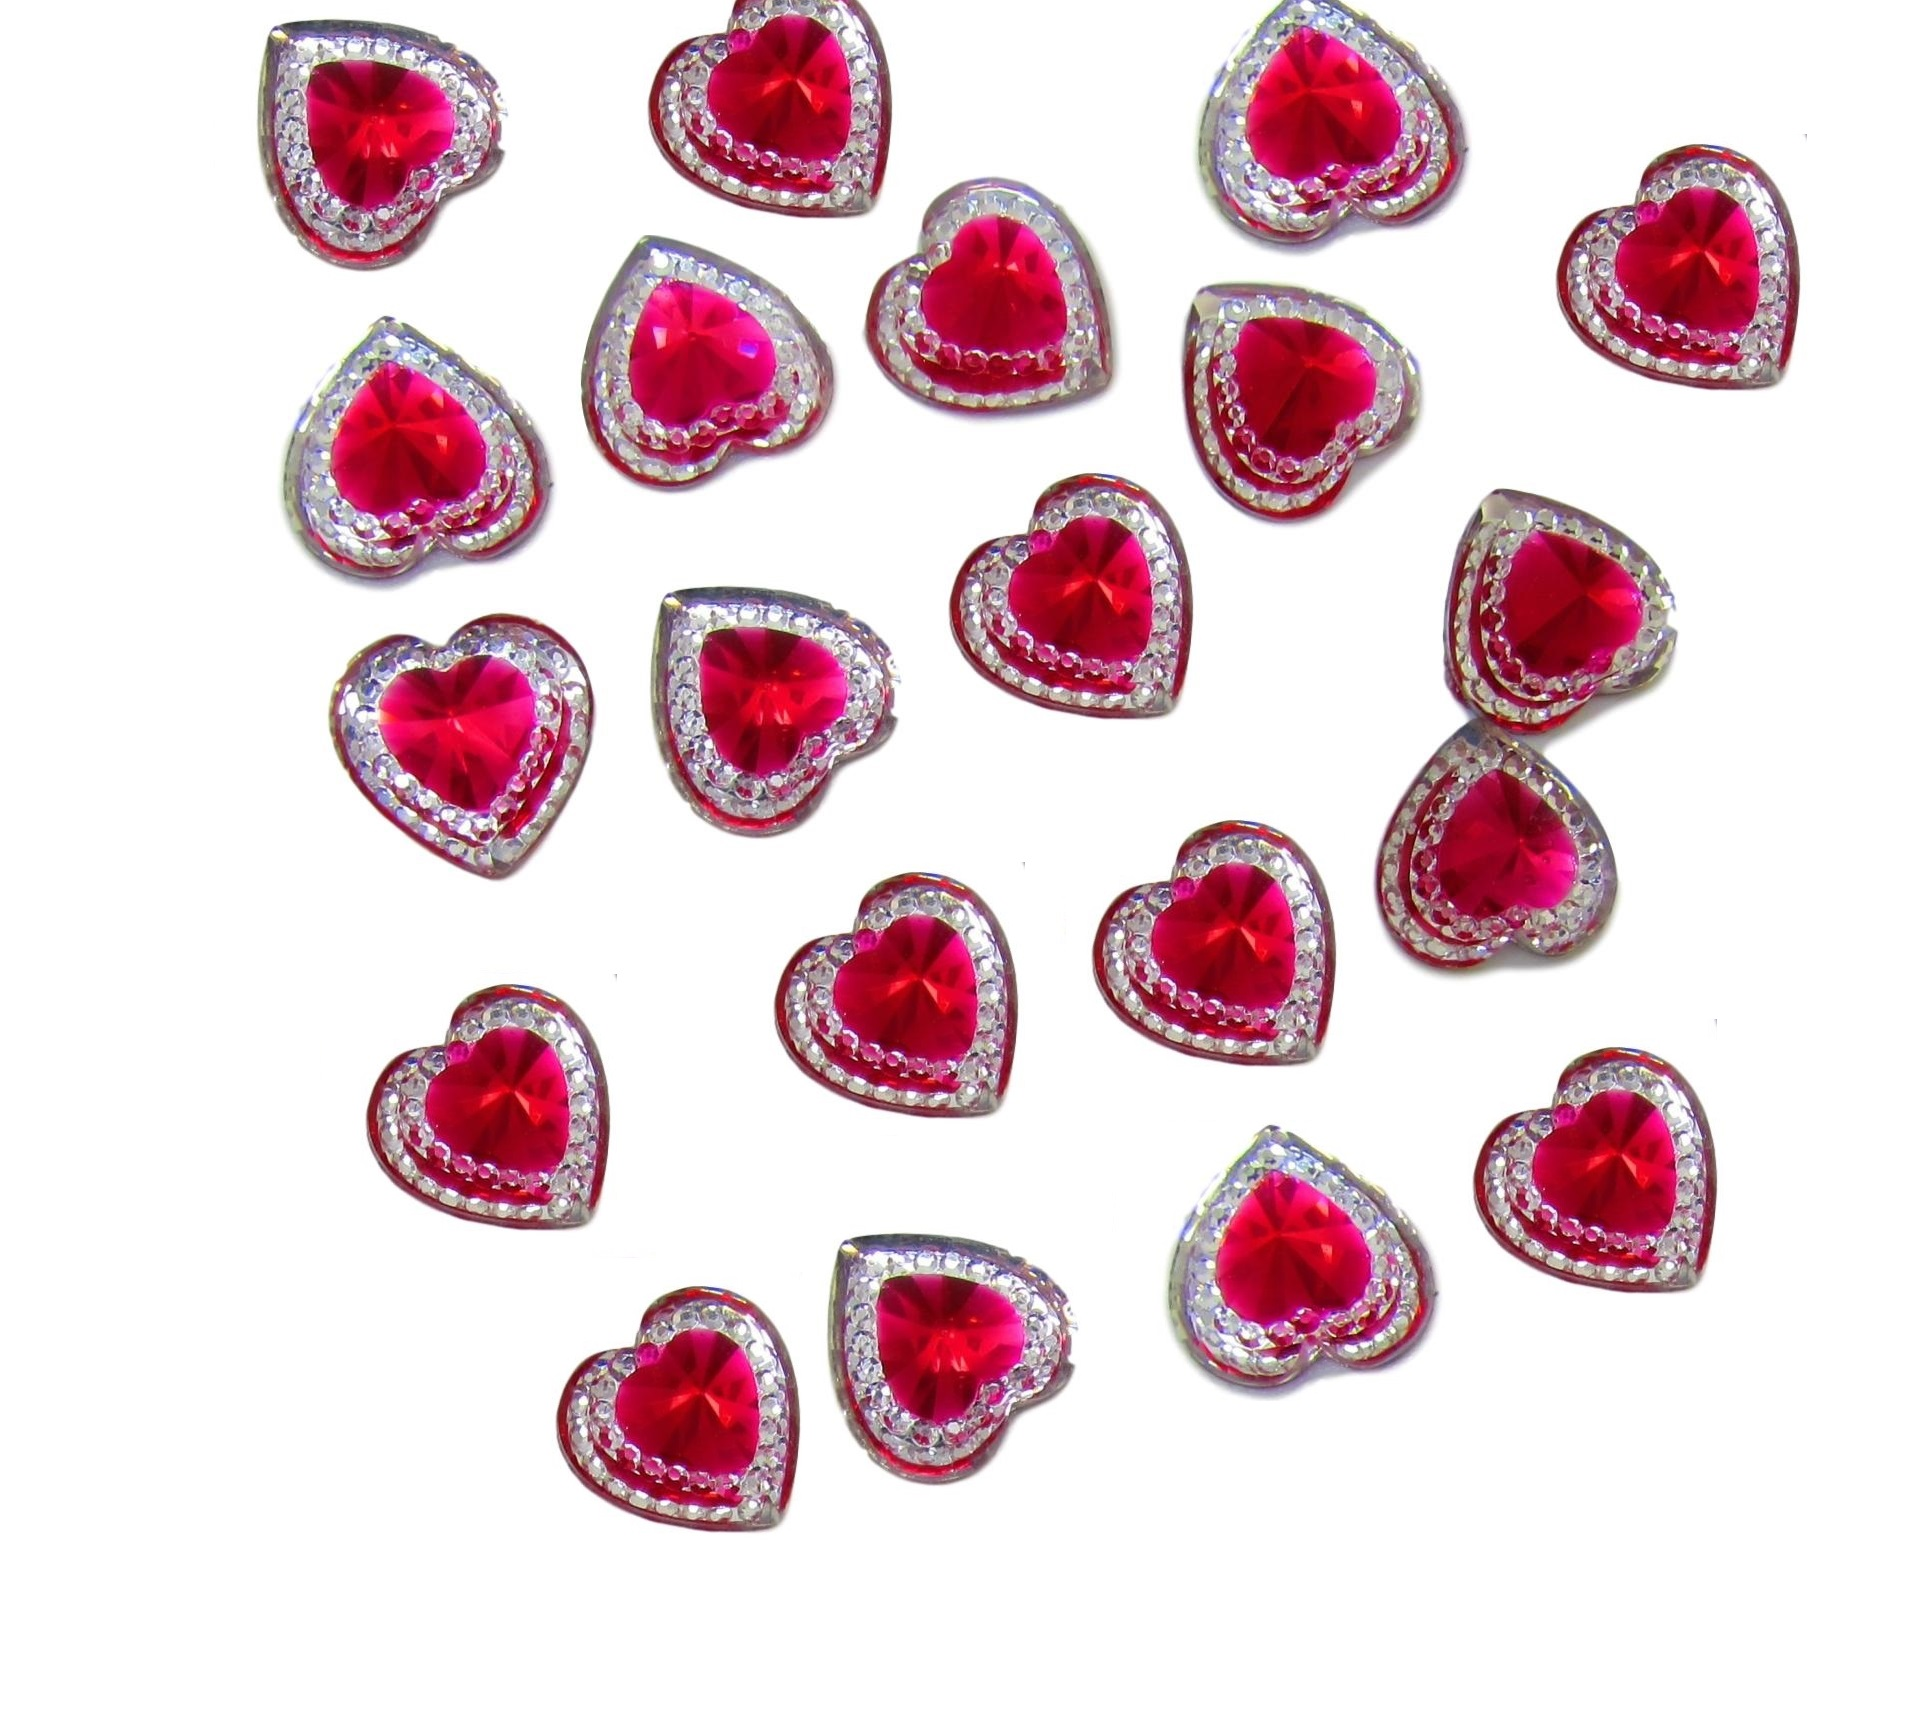 Acrylic /'Mini Hearts/' Embellishments PACK OF 10